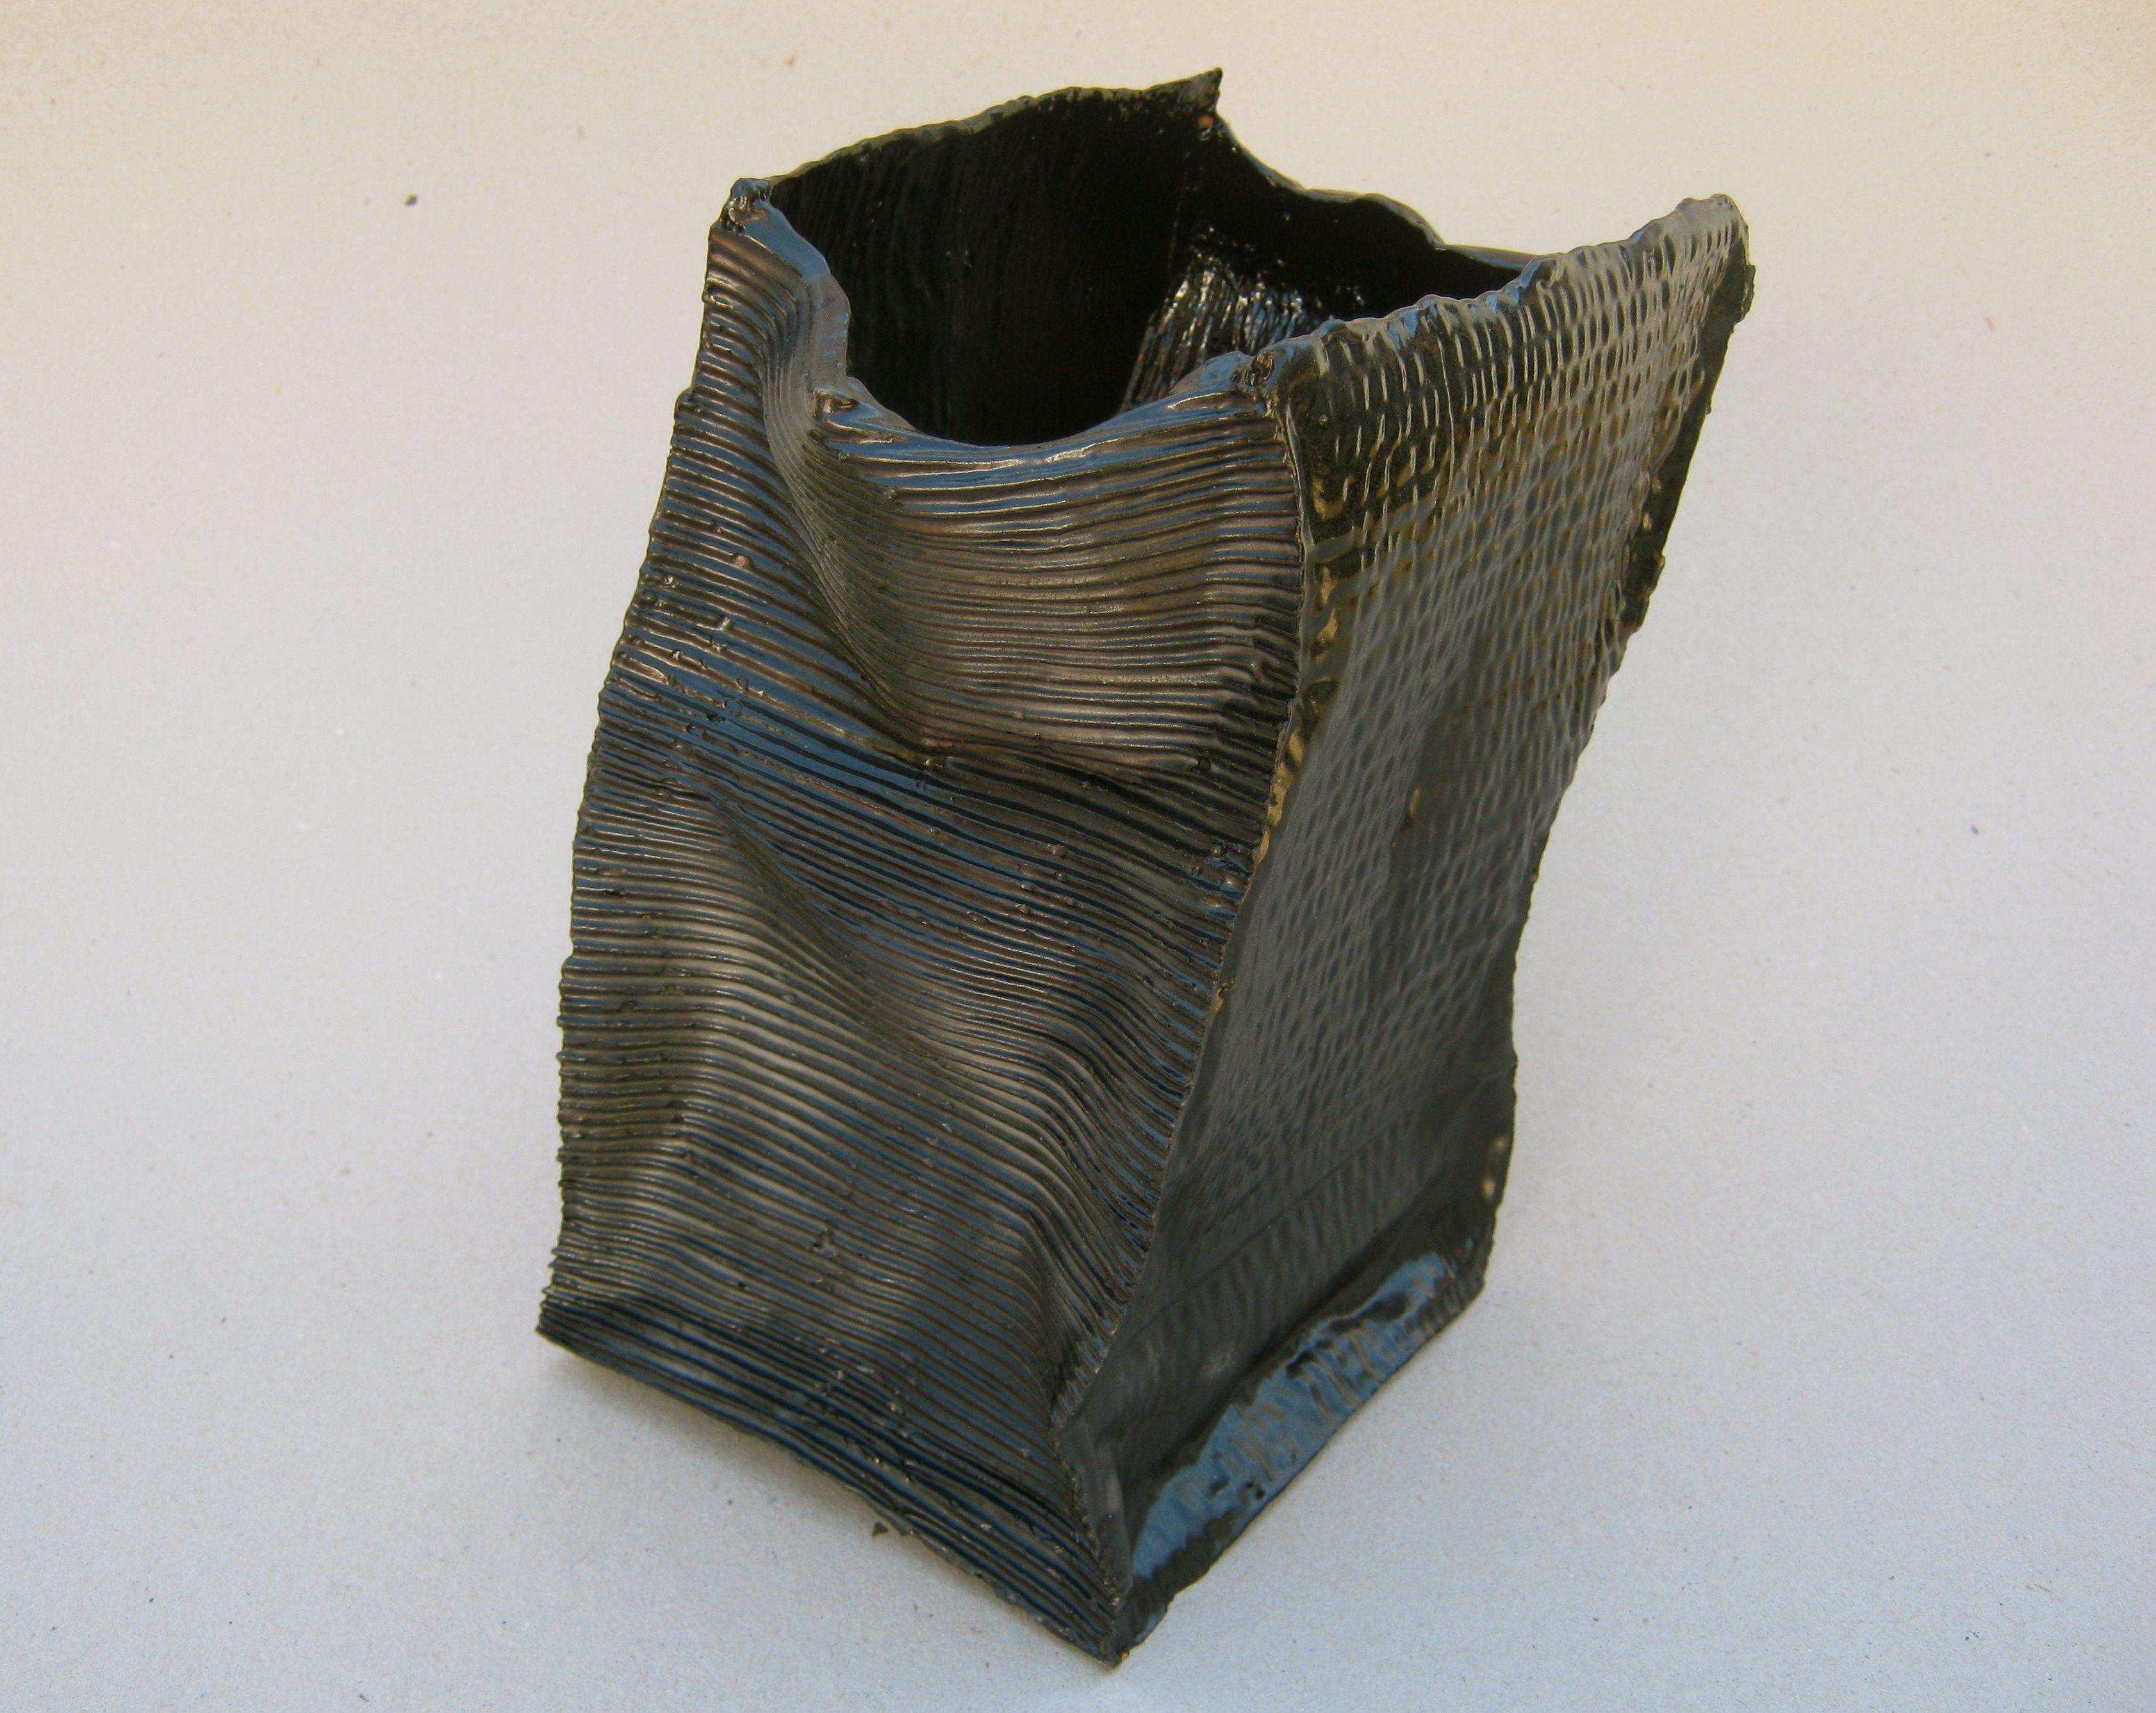 Black Vase, paperclay.